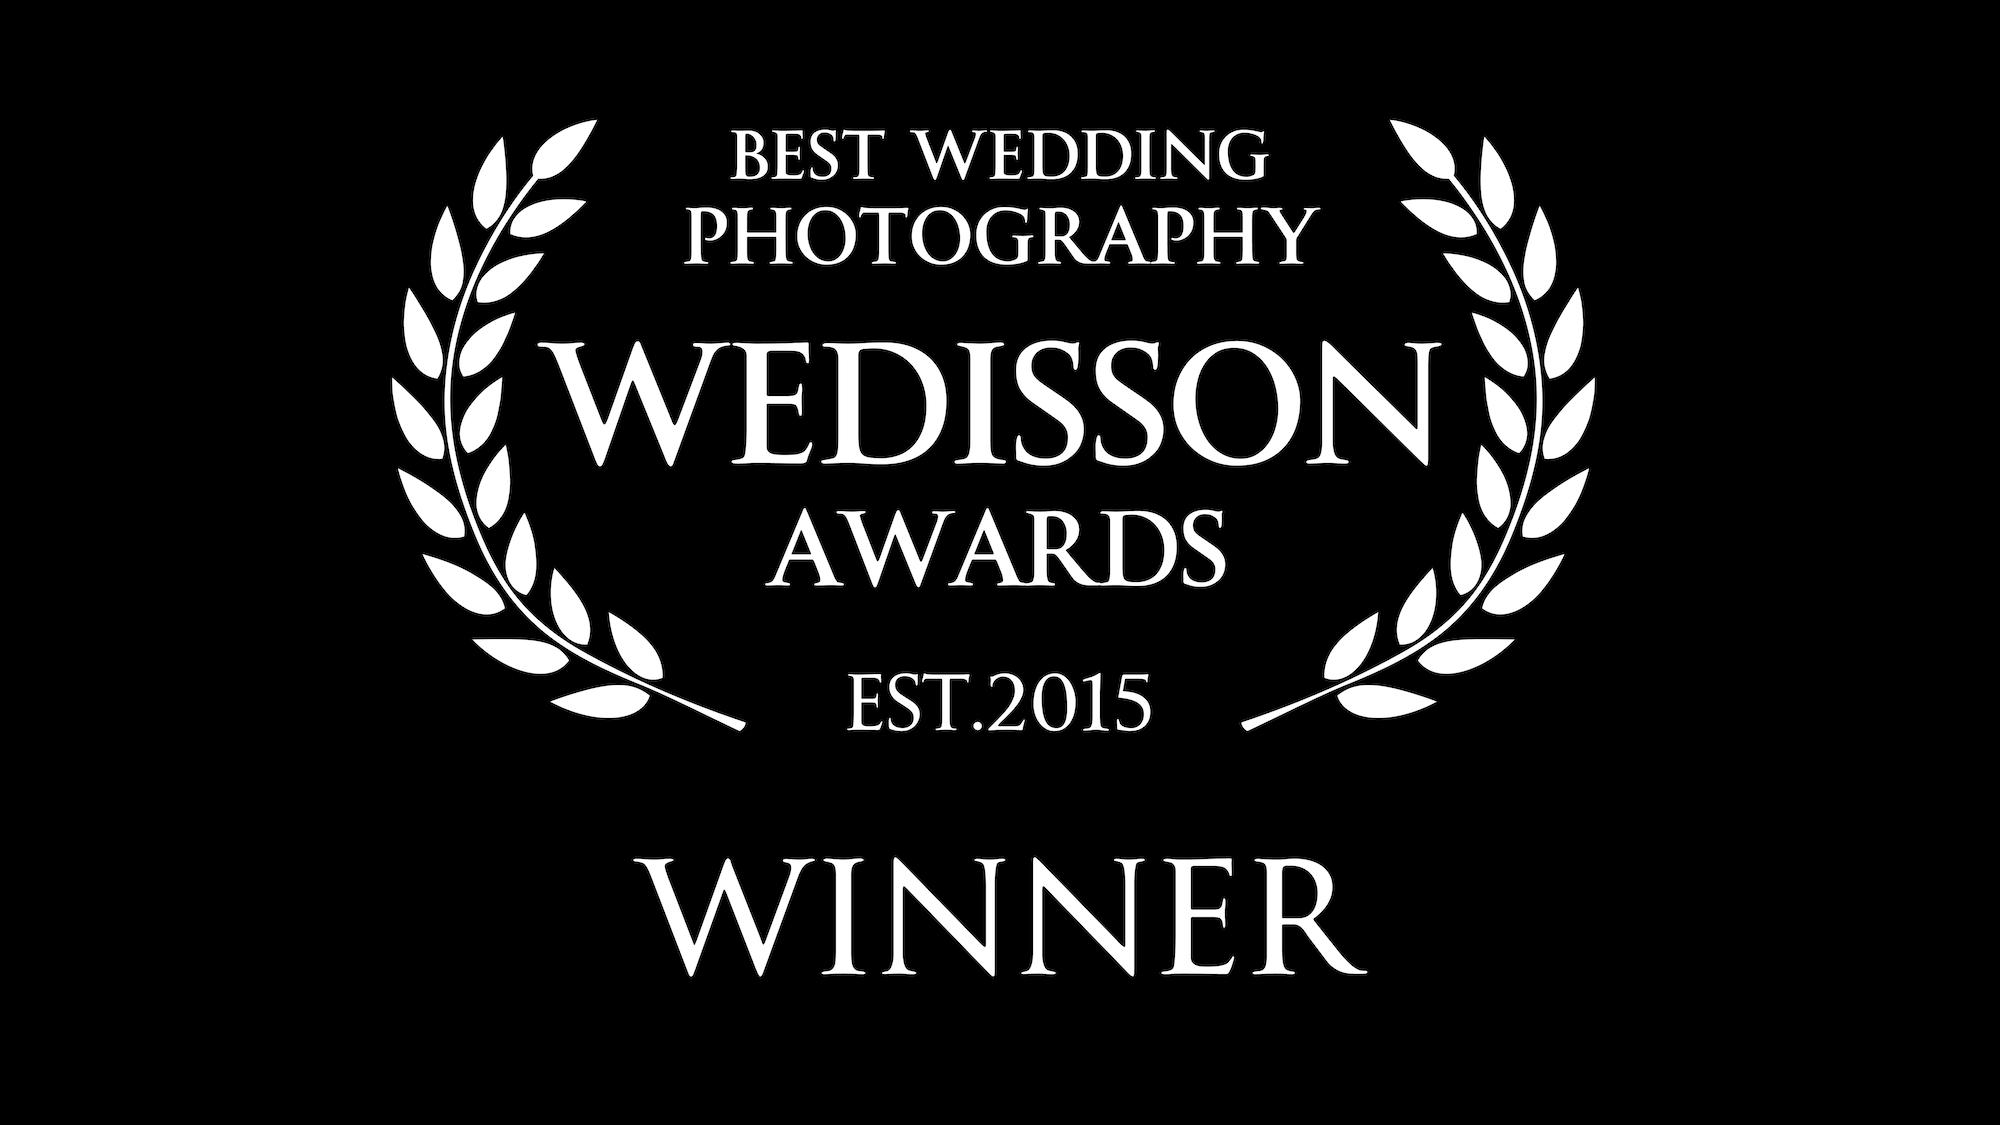 Wedisson Award